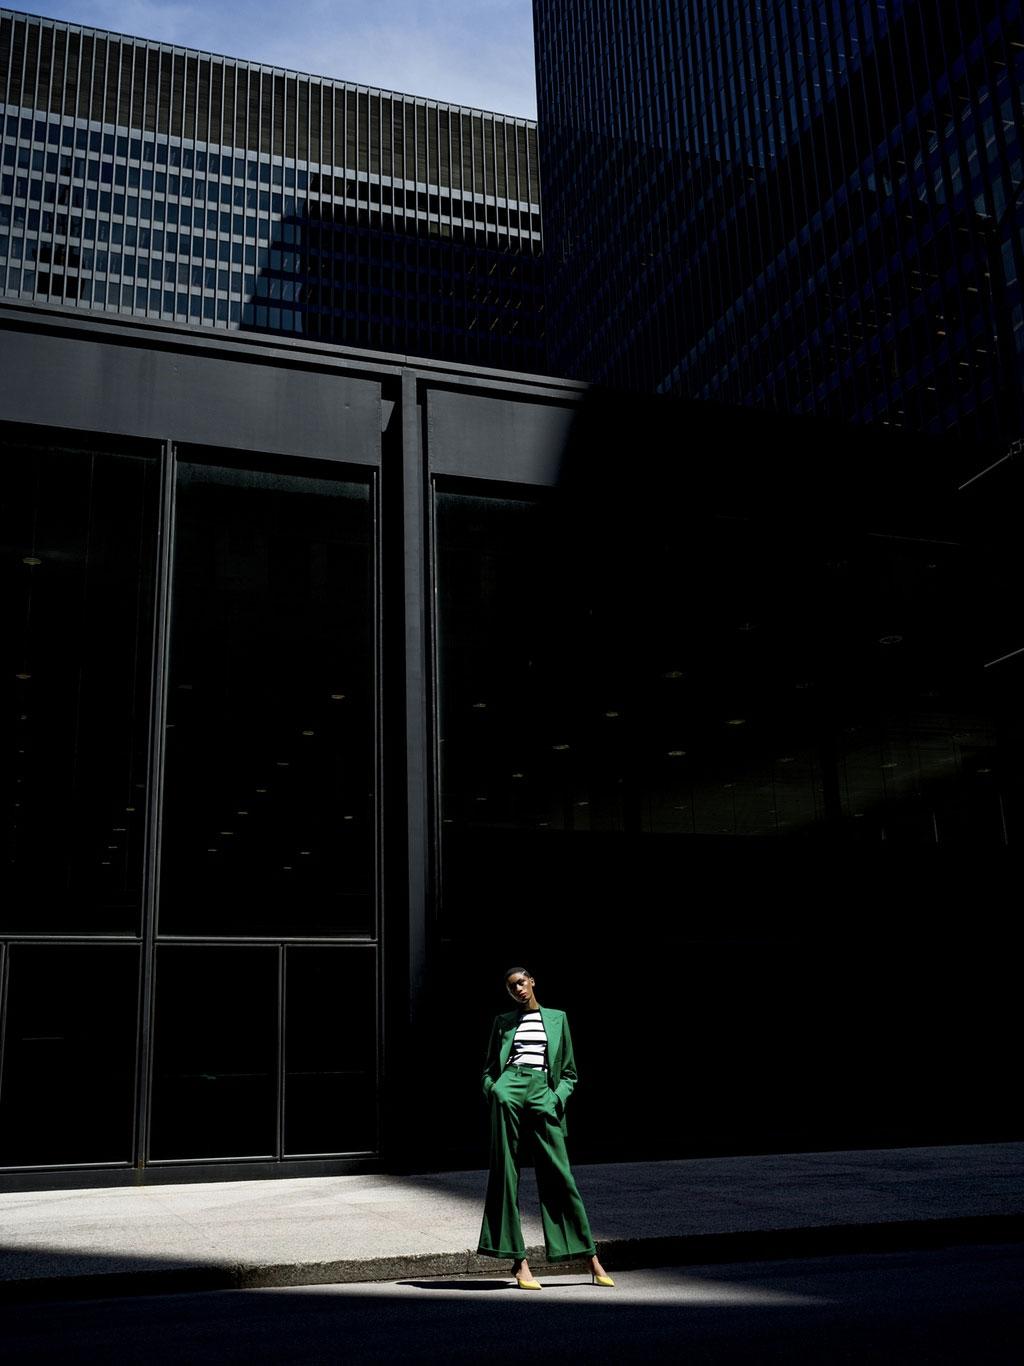 Chicago photographer Clarissa Bonet wins Hasselblad X You Grand Prize